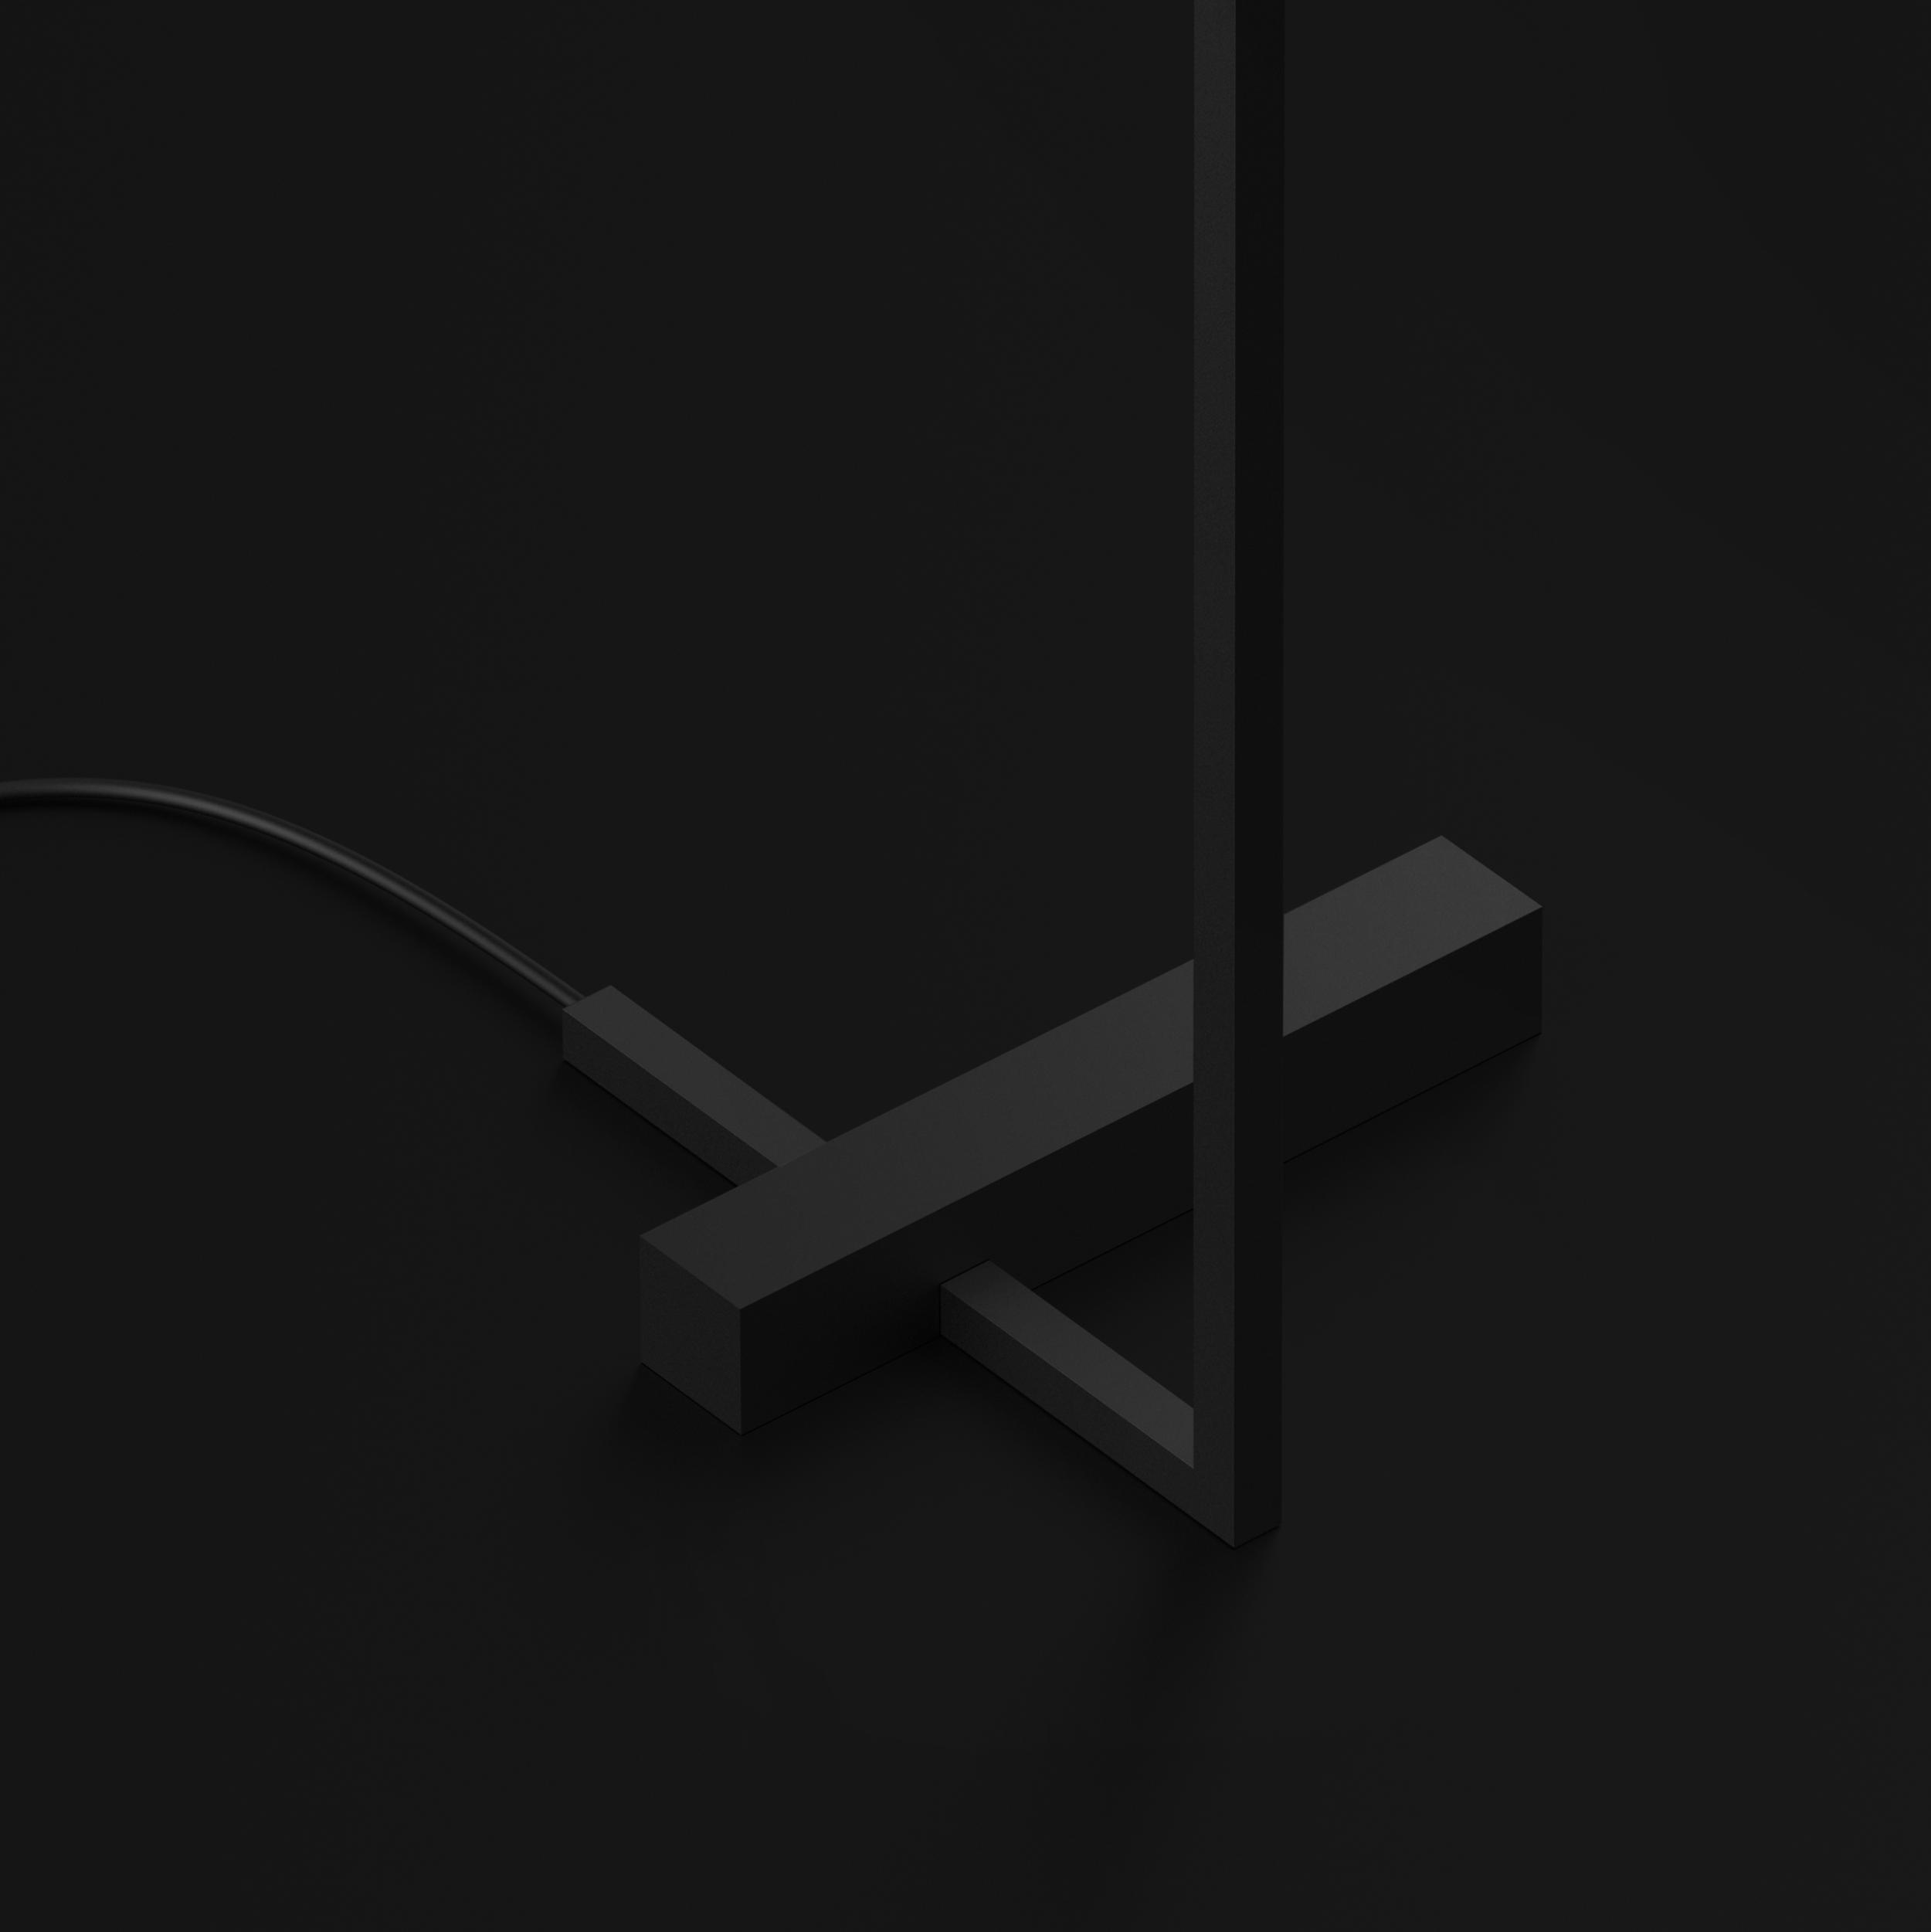 Vitka  Product design